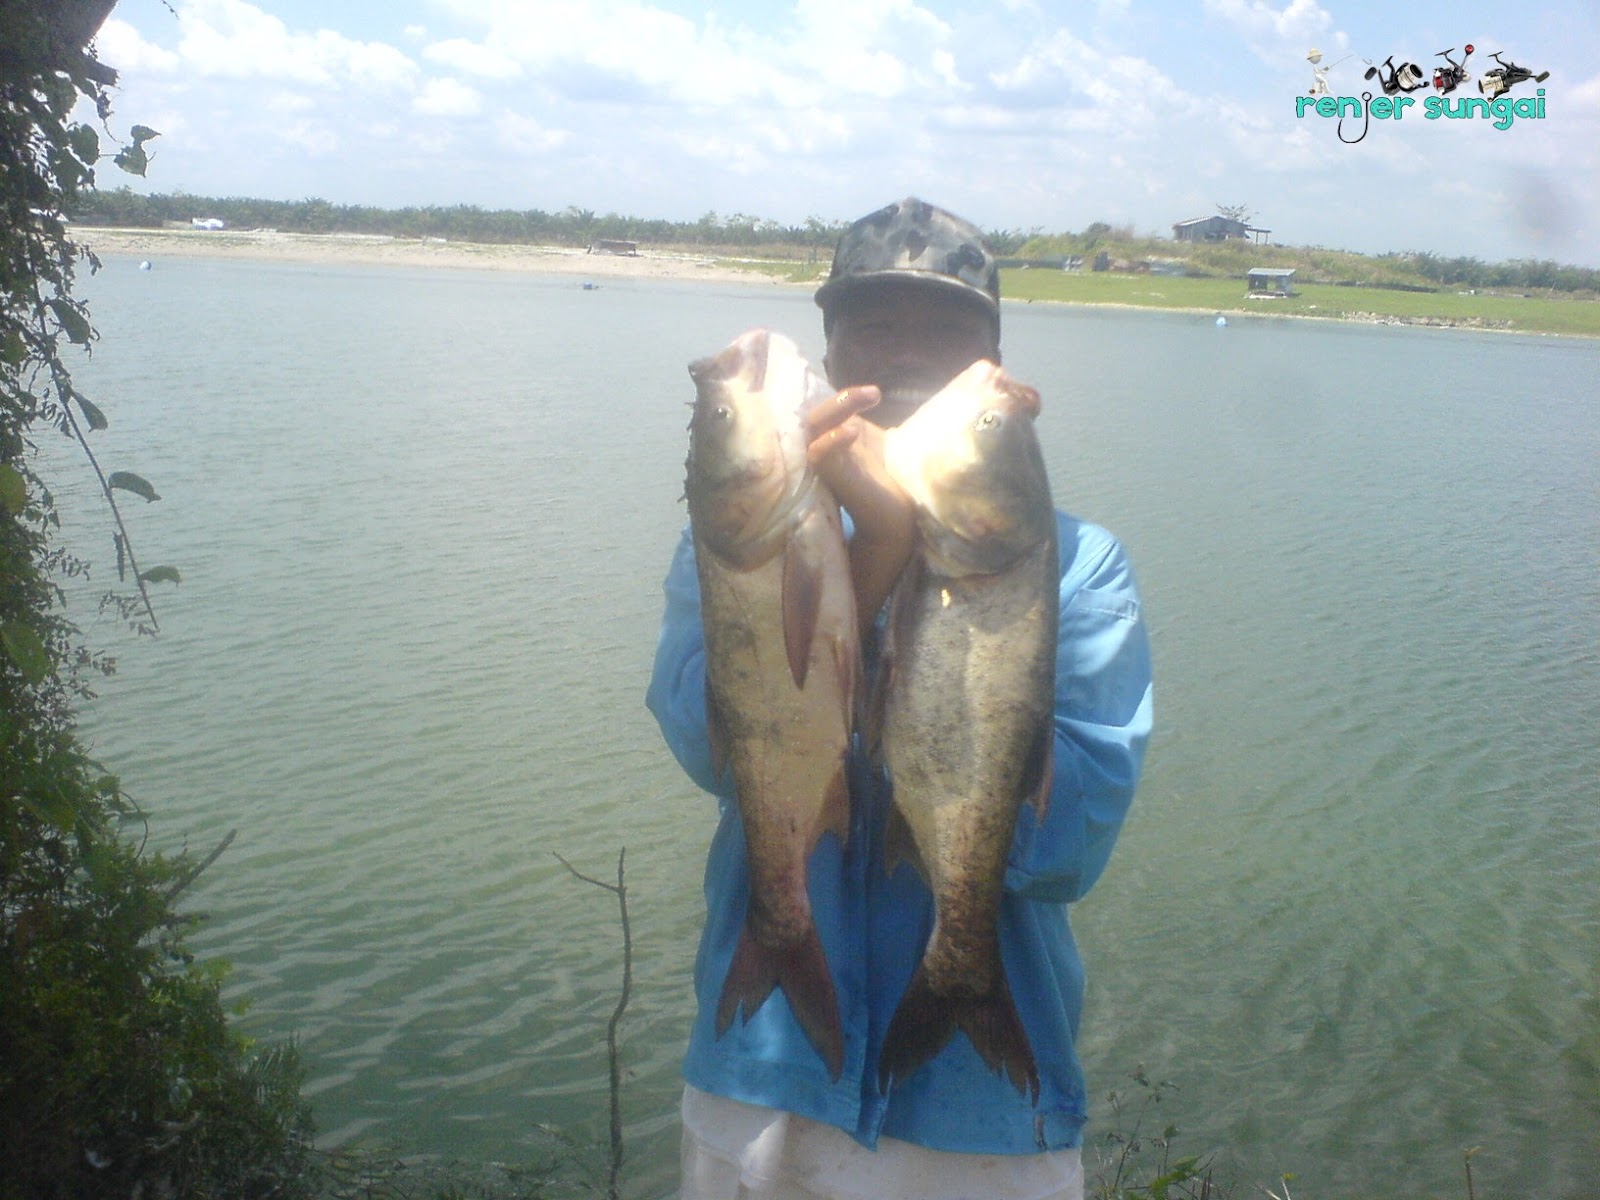 http://3.bp.blogspot.com/-EL1A0Oy0a7s/TzfixovazGI/AAAAAAAADmI/vA8dbTat5fI/s1600/DSC02619.JPG